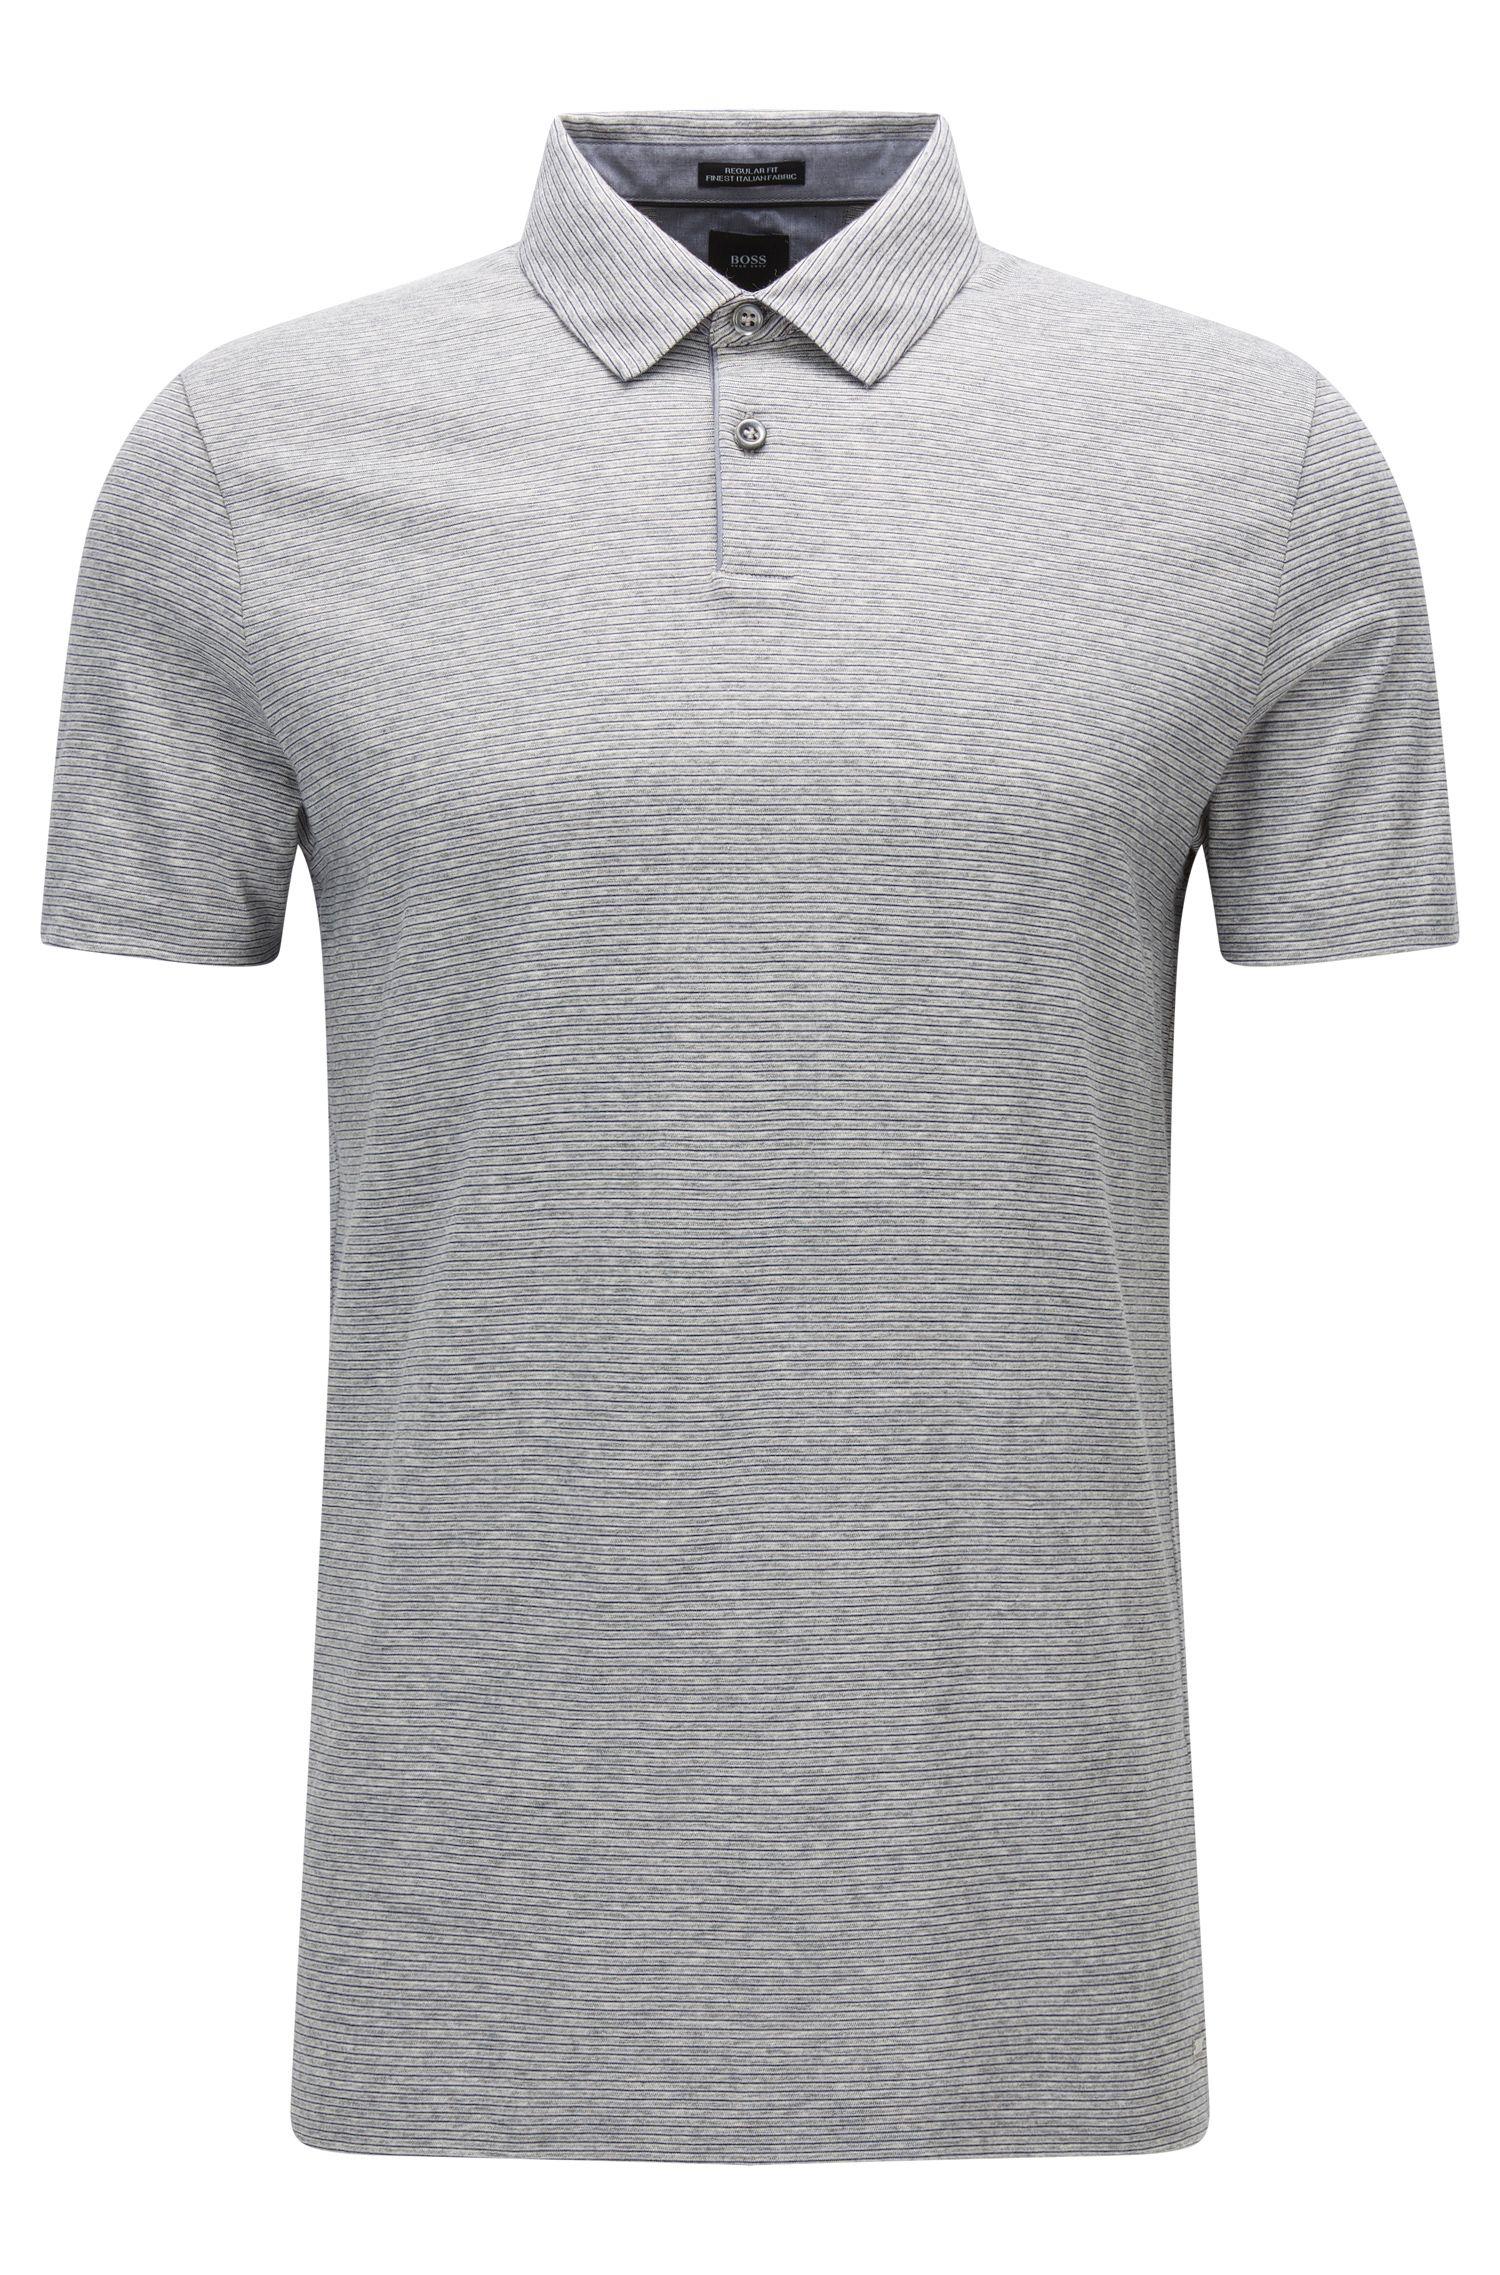 Regular-fit polo shirt in denim-look cotton